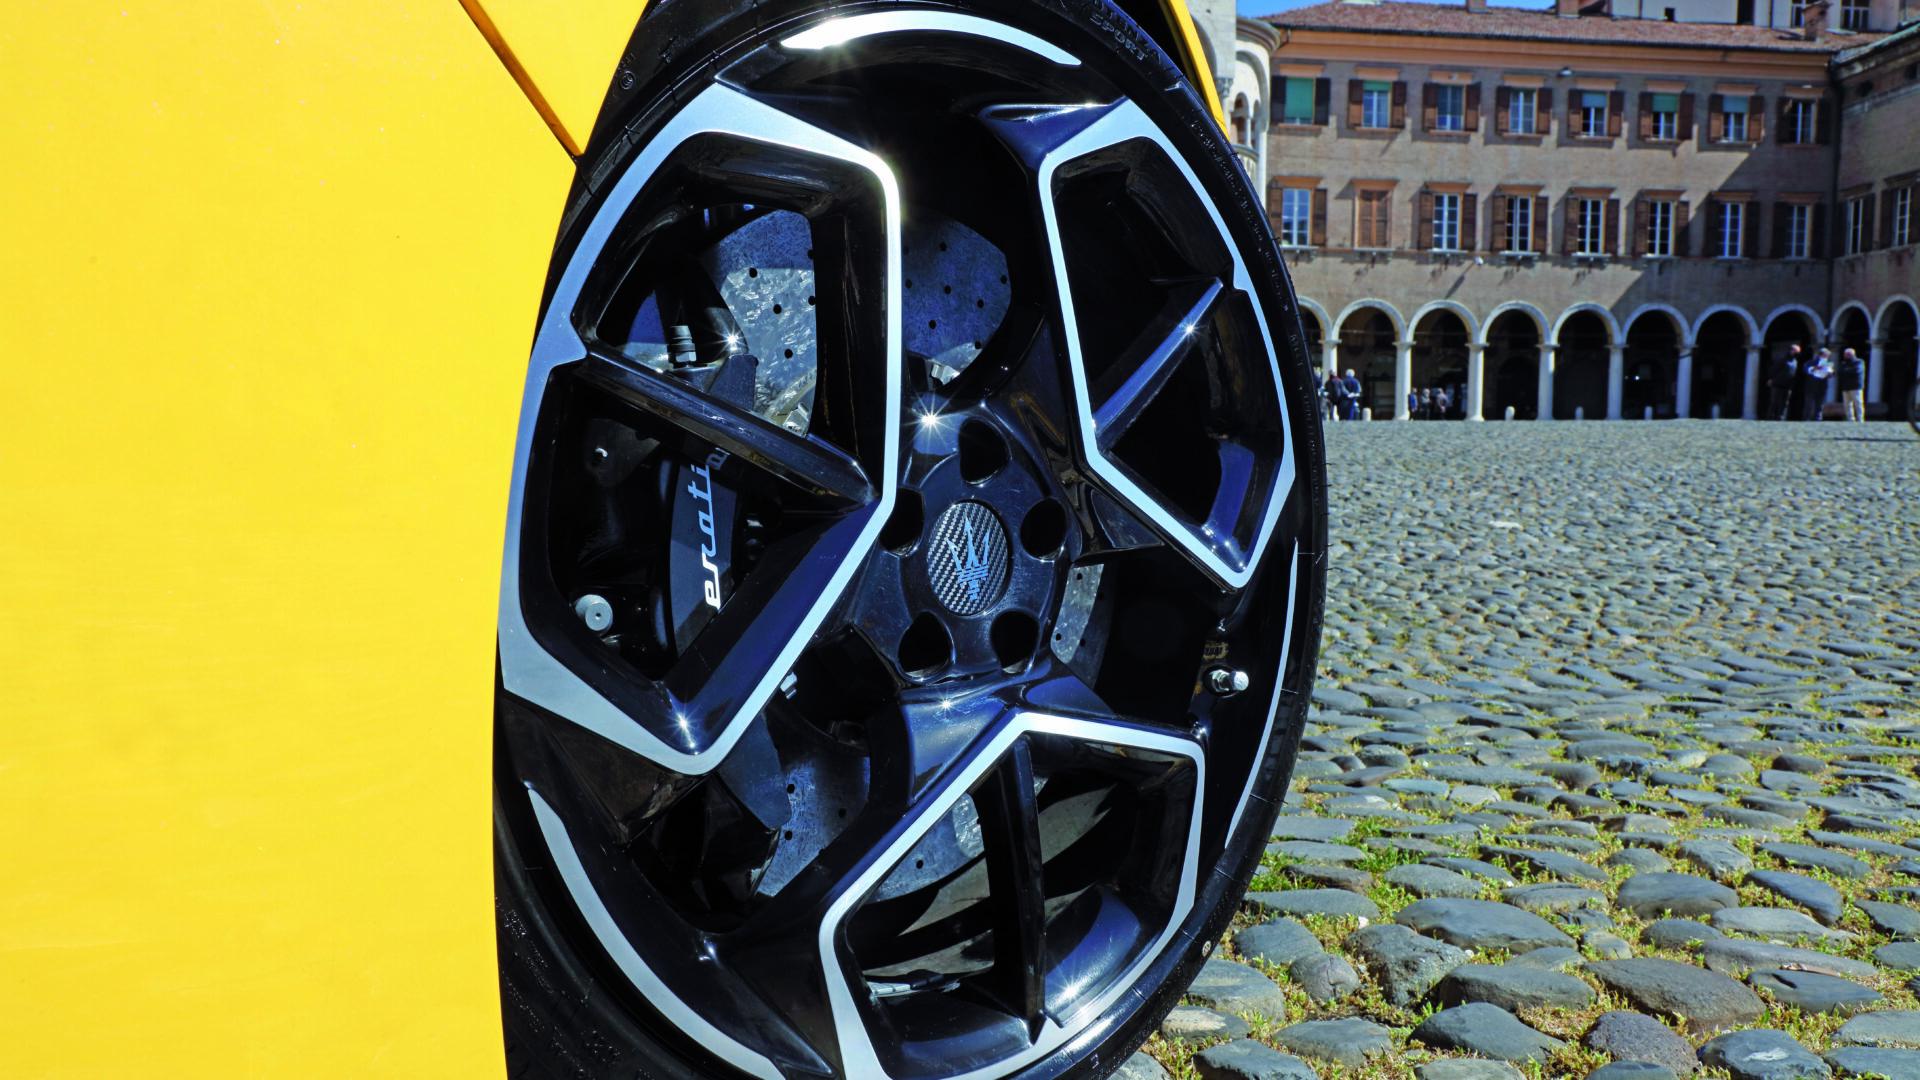 Maserati MC20 Llantas edited